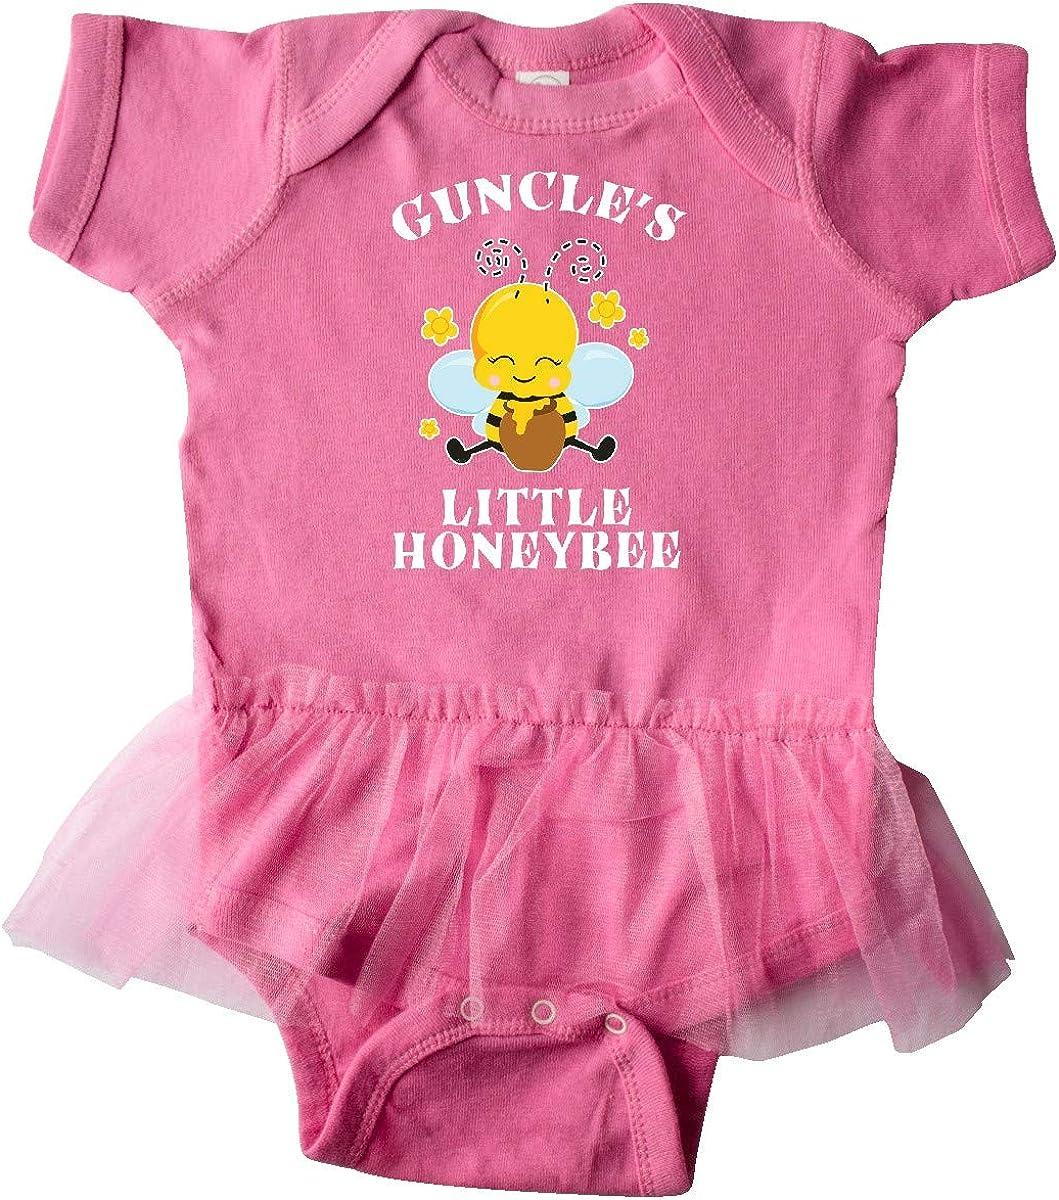 inktastic Cute Bee Guncles Little Honeybee with Stars Infant Tutu Bodysuit